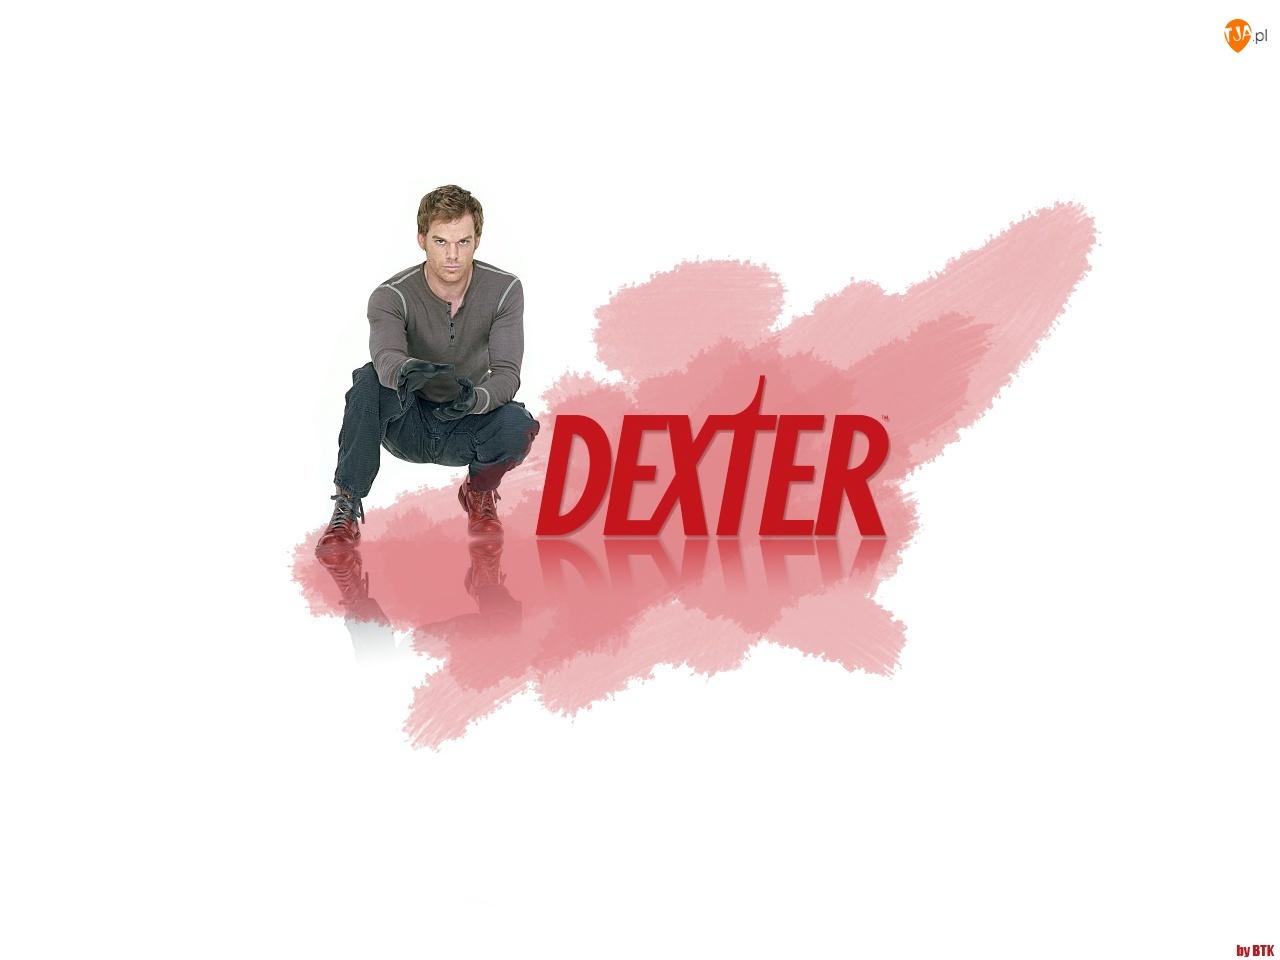 Michael C. Hall, Mężczyzna, Dexter